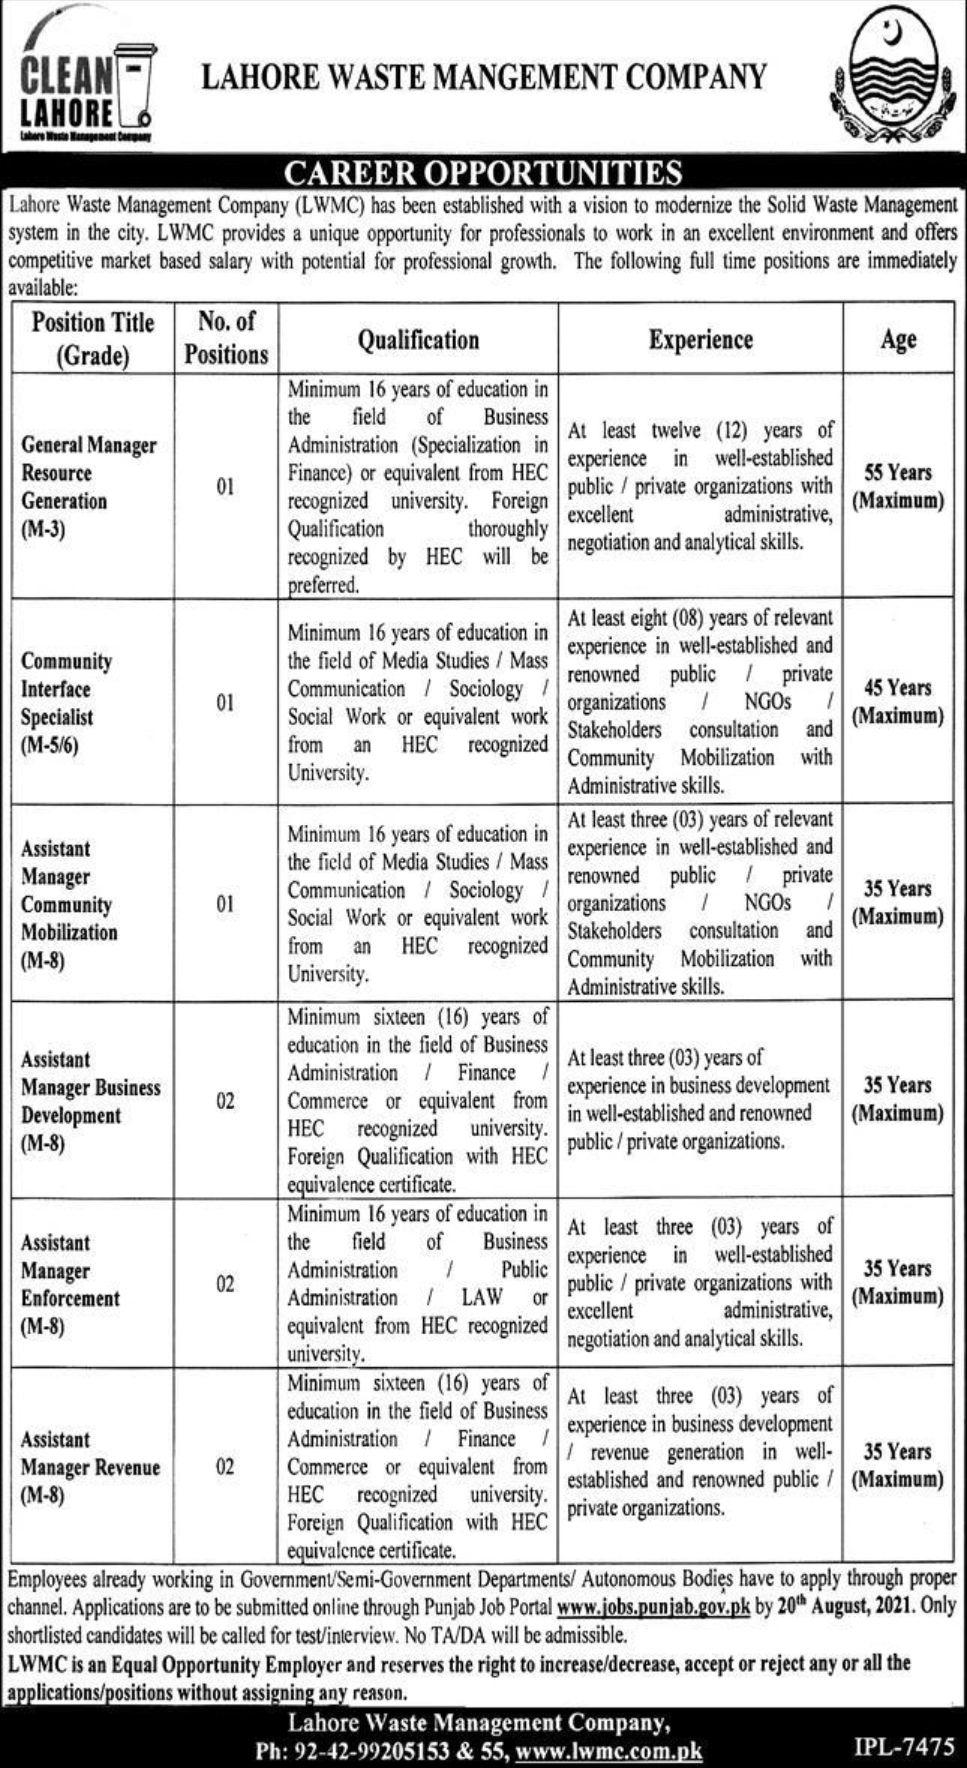 Lahore Waste Management Company Vacancies 2021 1